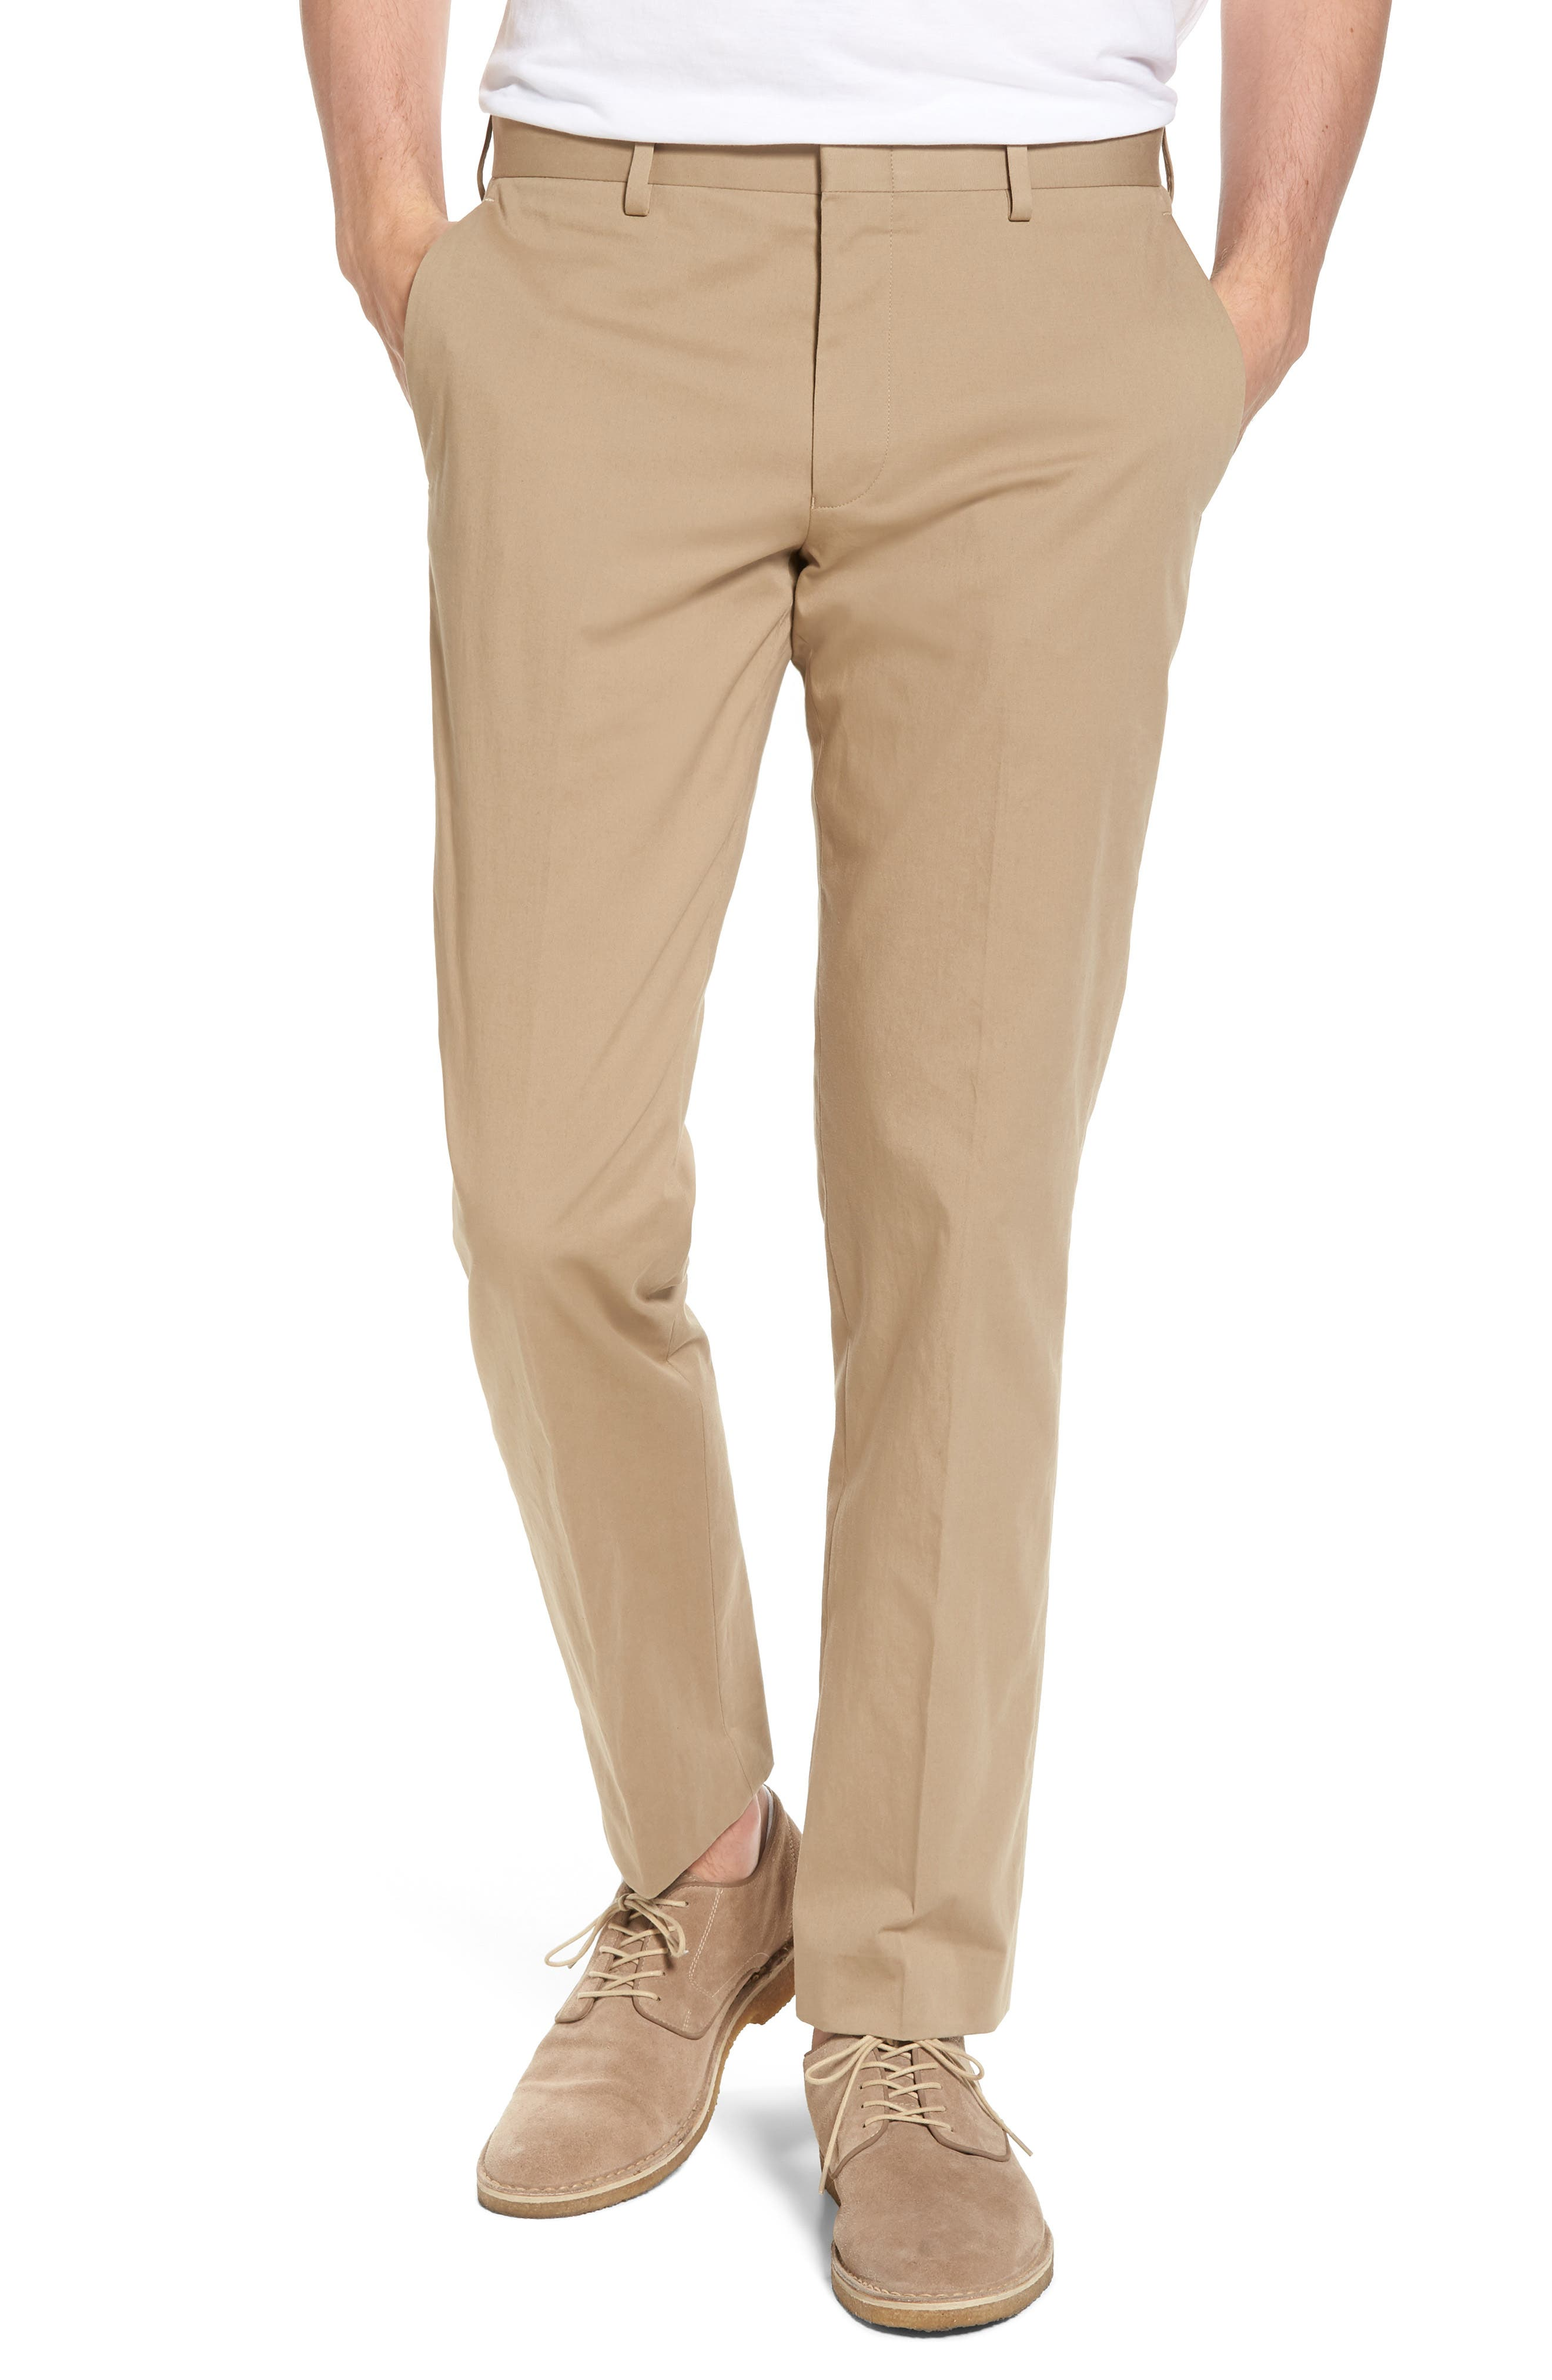 J.Crew Ludlow Stretch Chino Suit Pants